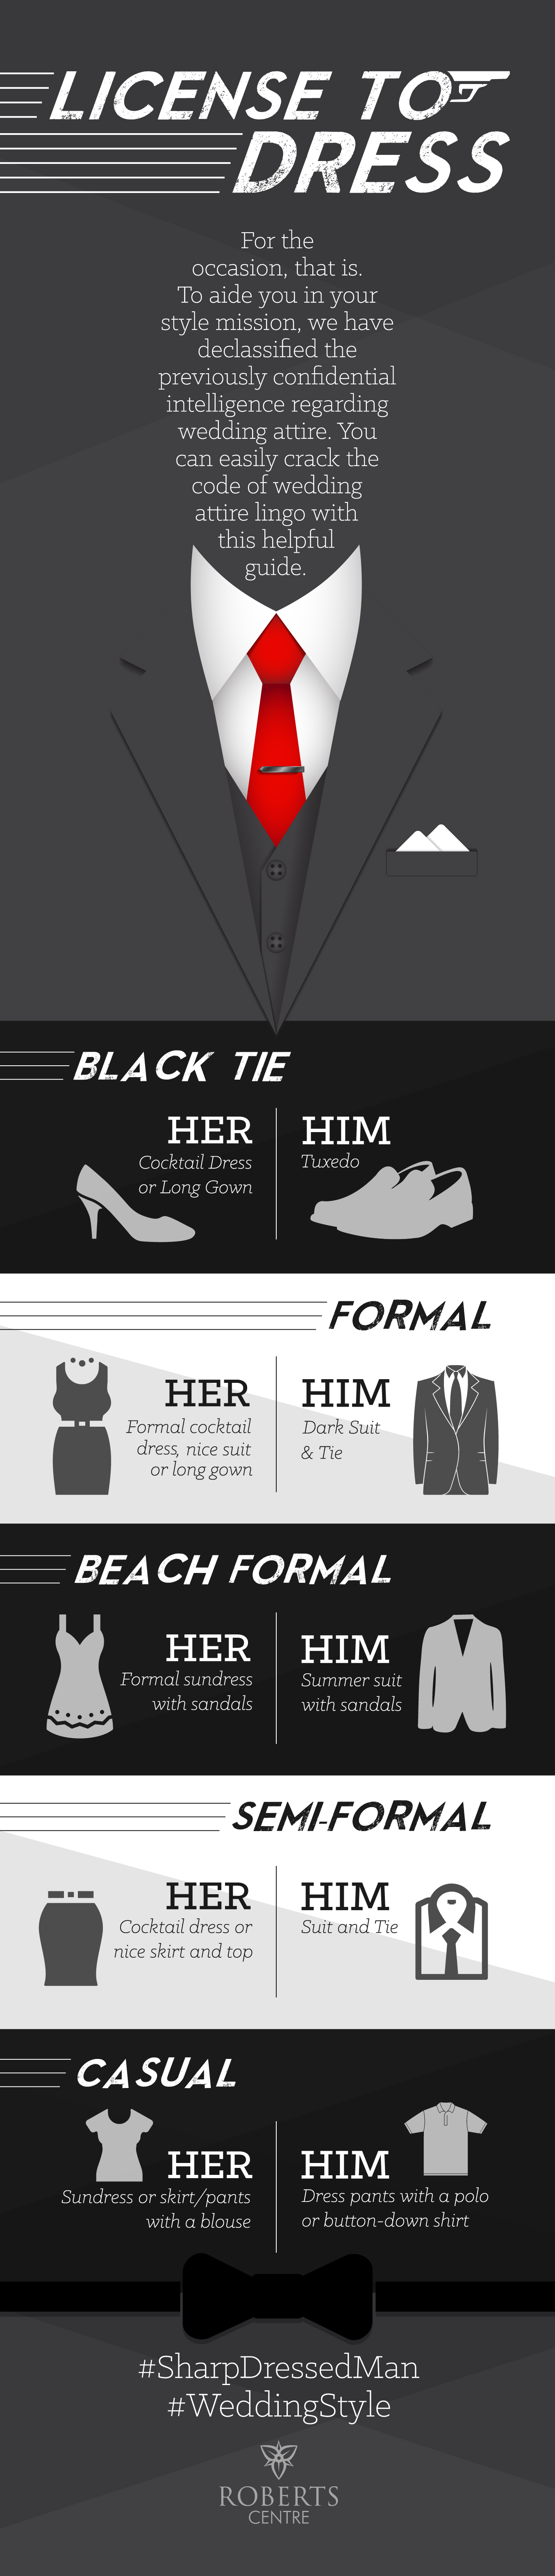 ef23e7f3140 Deciphering Wedding Guest Dress Code - Wedding Guest Attire Tips